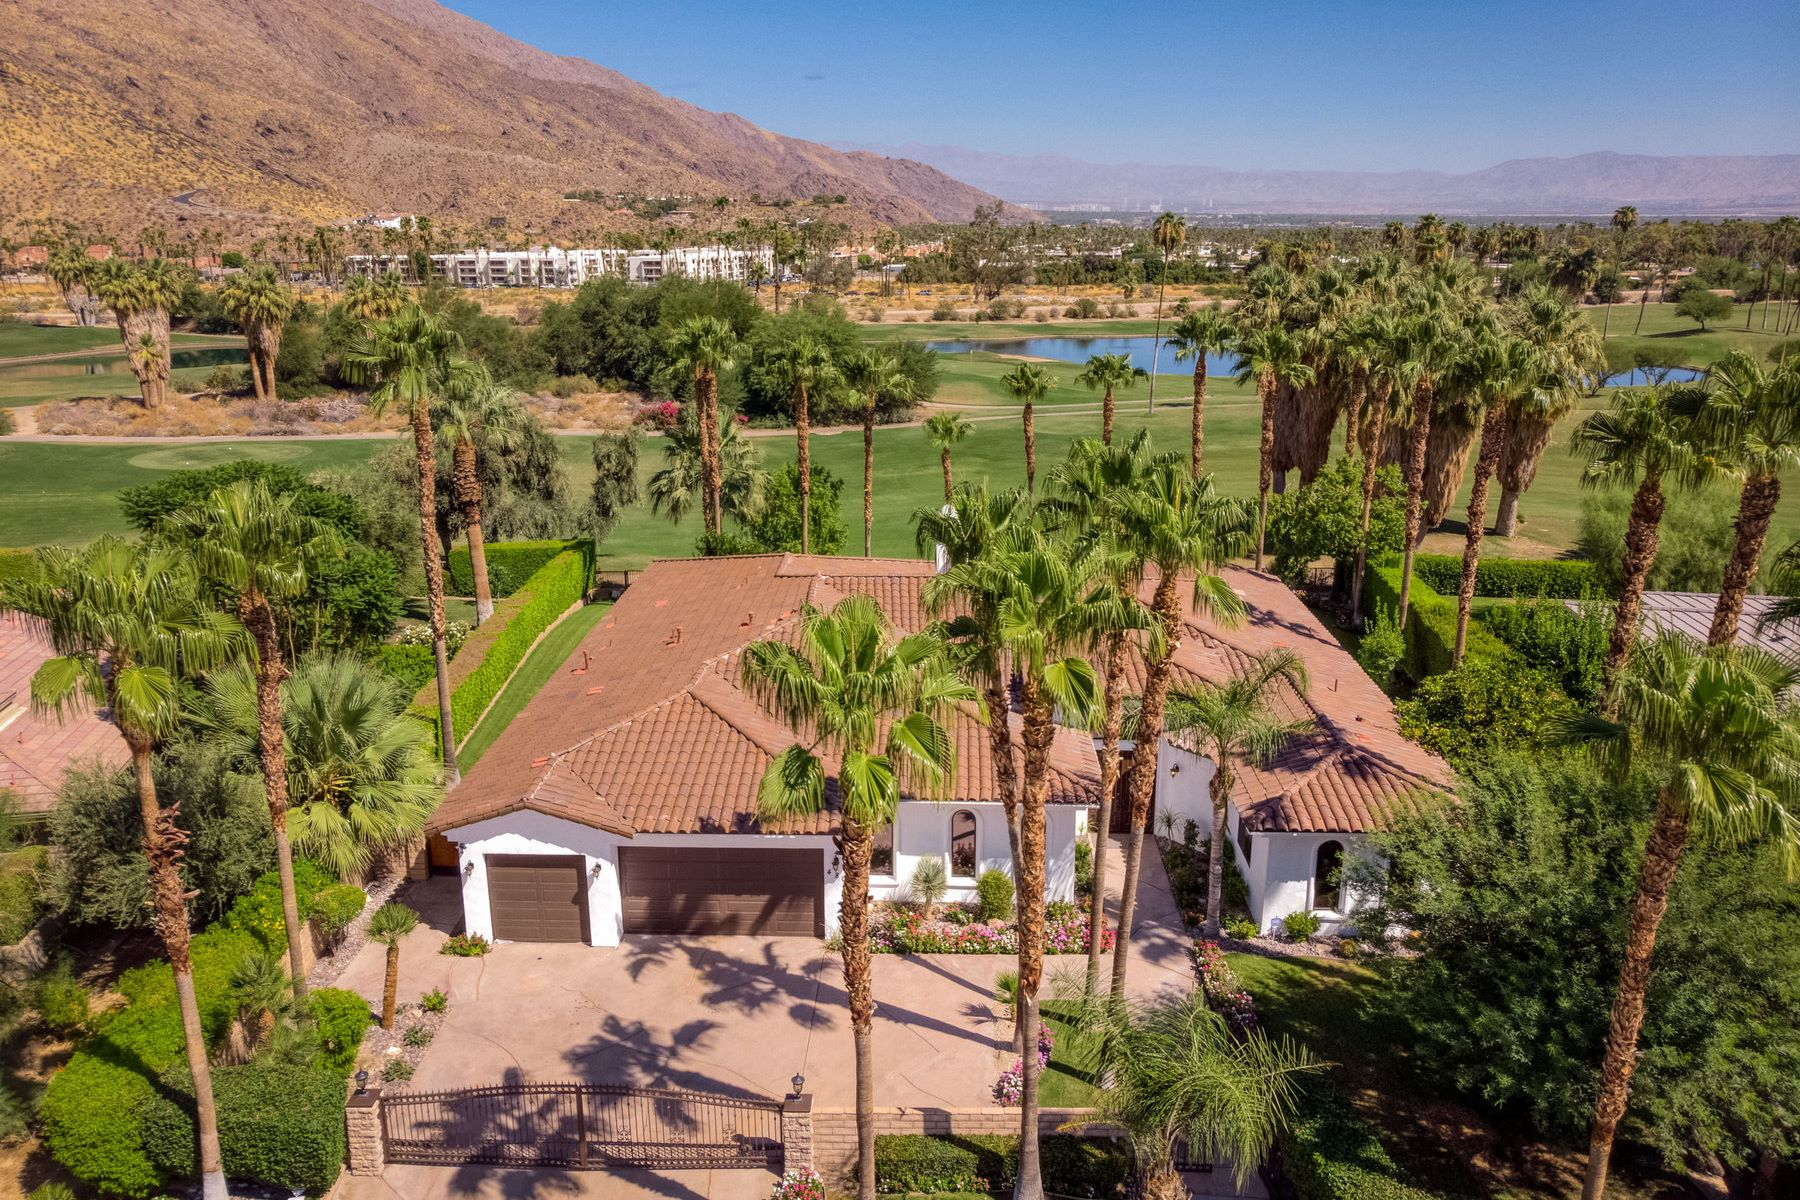 Single Family Homes for Sale at 480 E Bogert Trails 480 E Bogert Trail Palm Springs, California 92264 United States